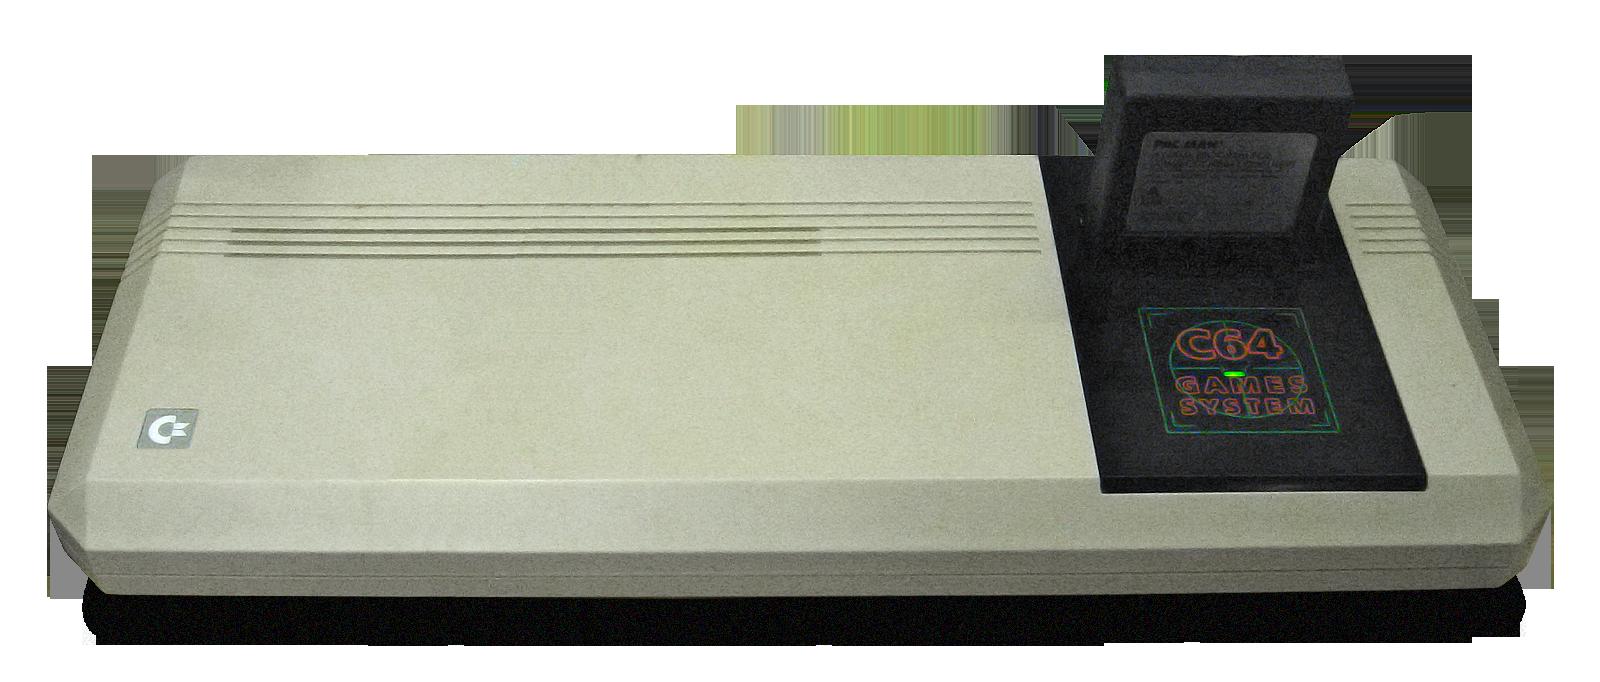 Commodore 64 Games System - Wikipedia